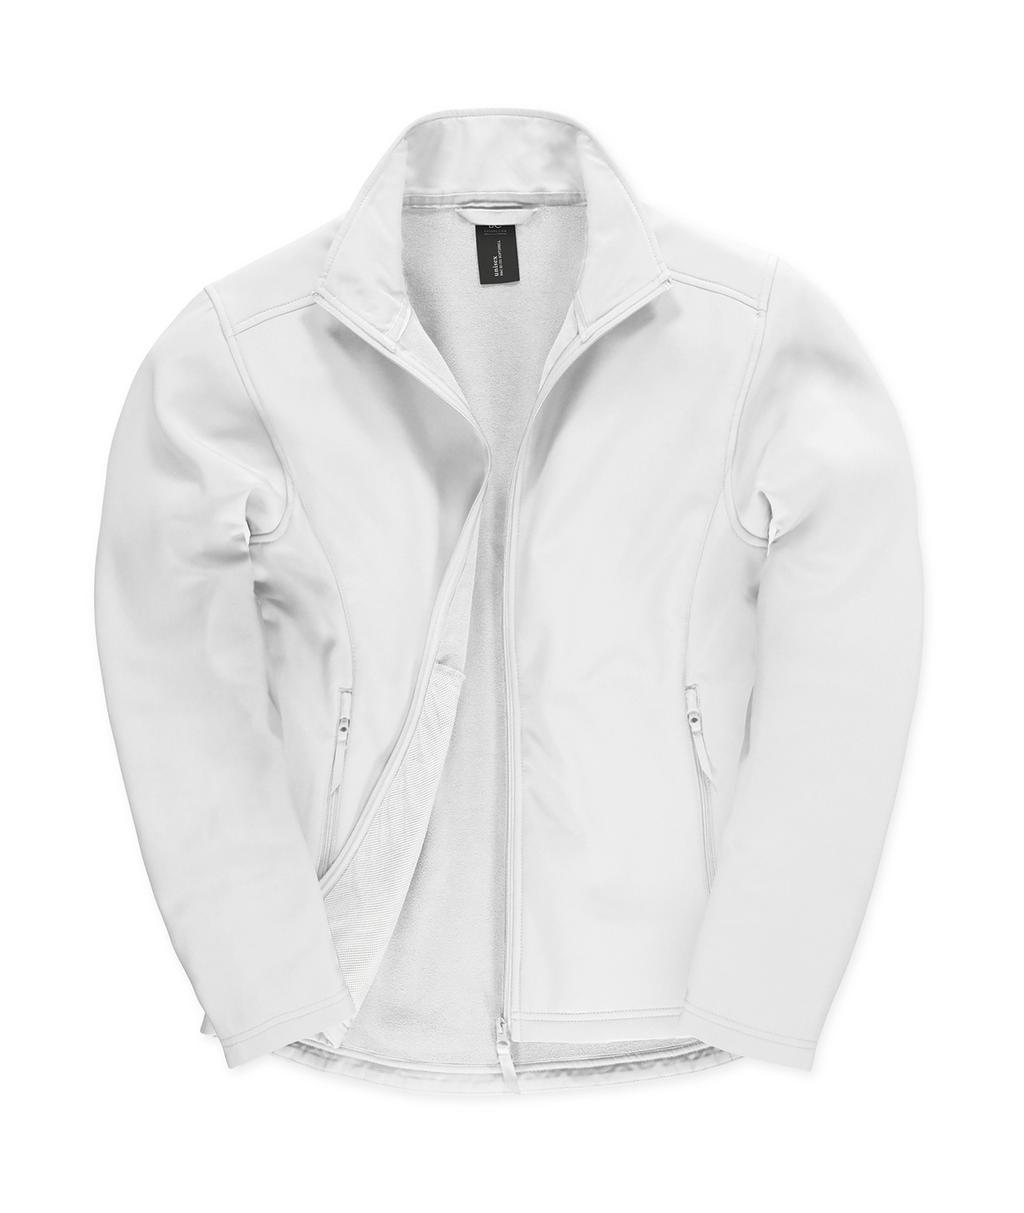 Softshell Jacket ID.701